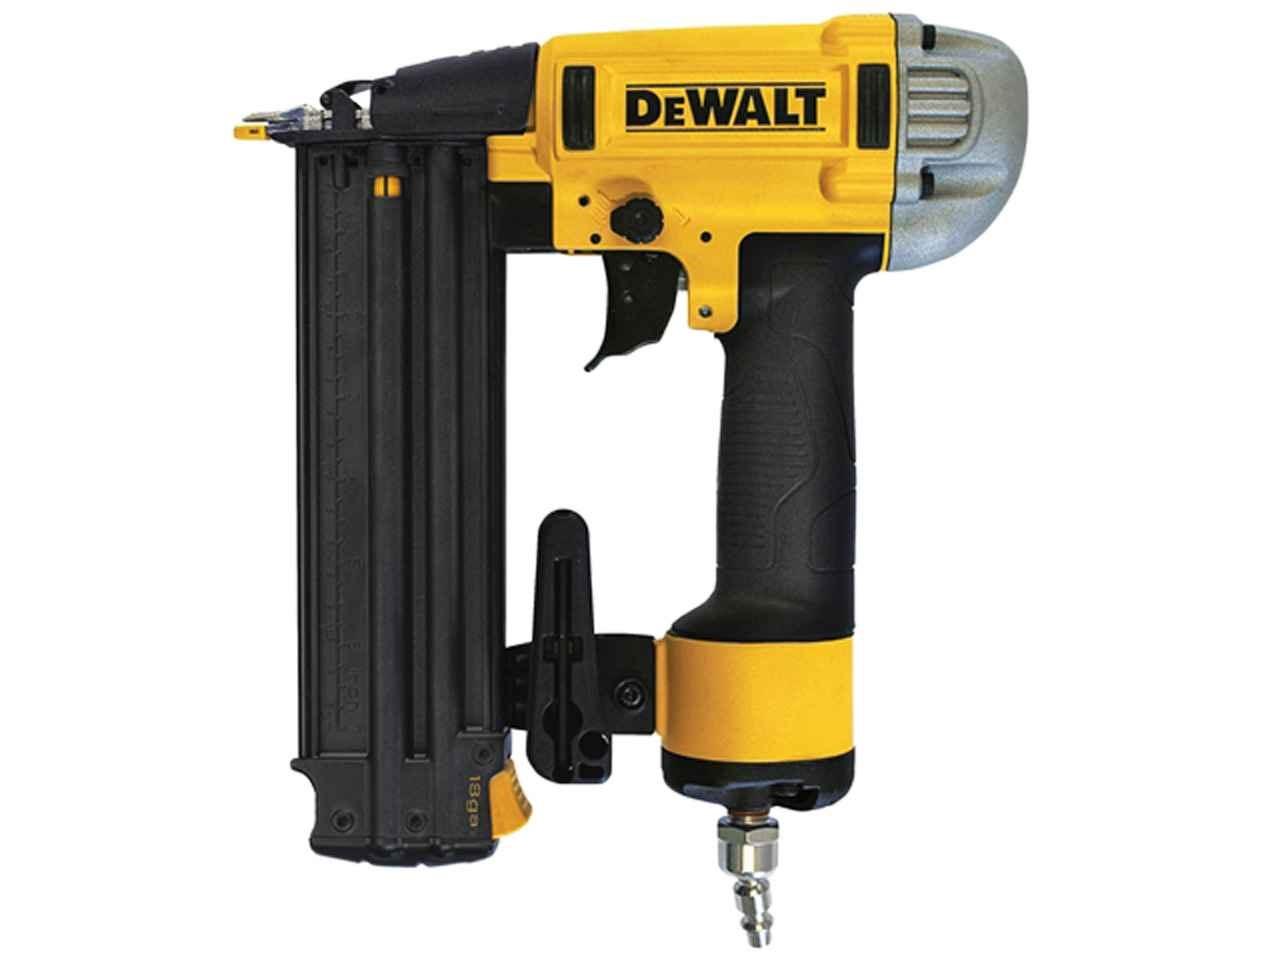 DeWalt DPN1850PP 18 Gauge 15-50mm Oil-Free Brad Nailer